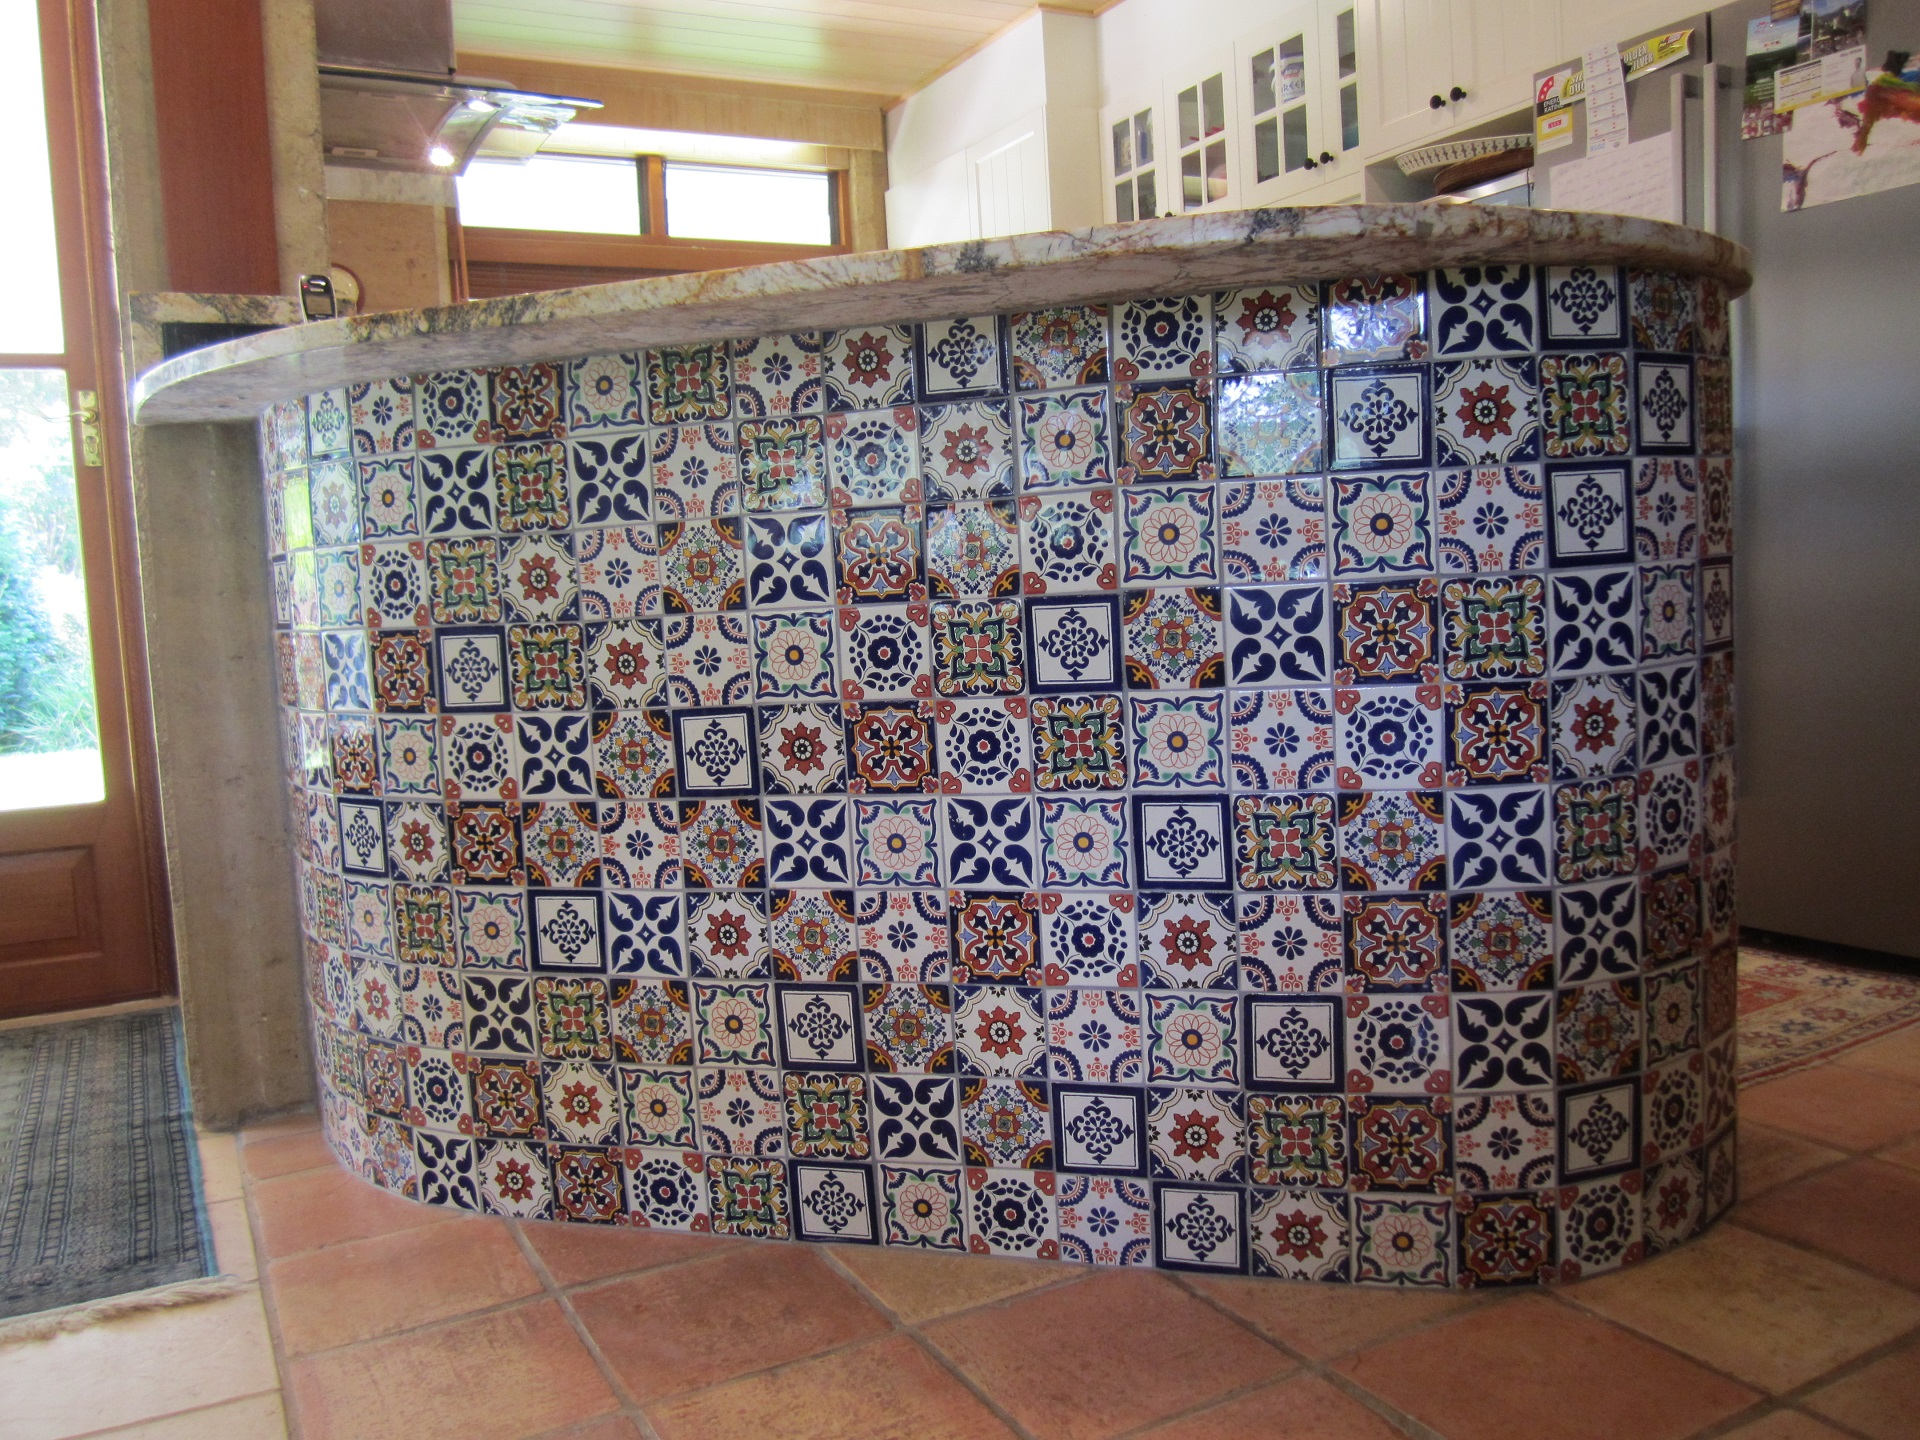 Brisbane Kitchen Design Samford  Traditional Kitchen Renovation Raised Servery Moroccan Style Mosiac  (9)